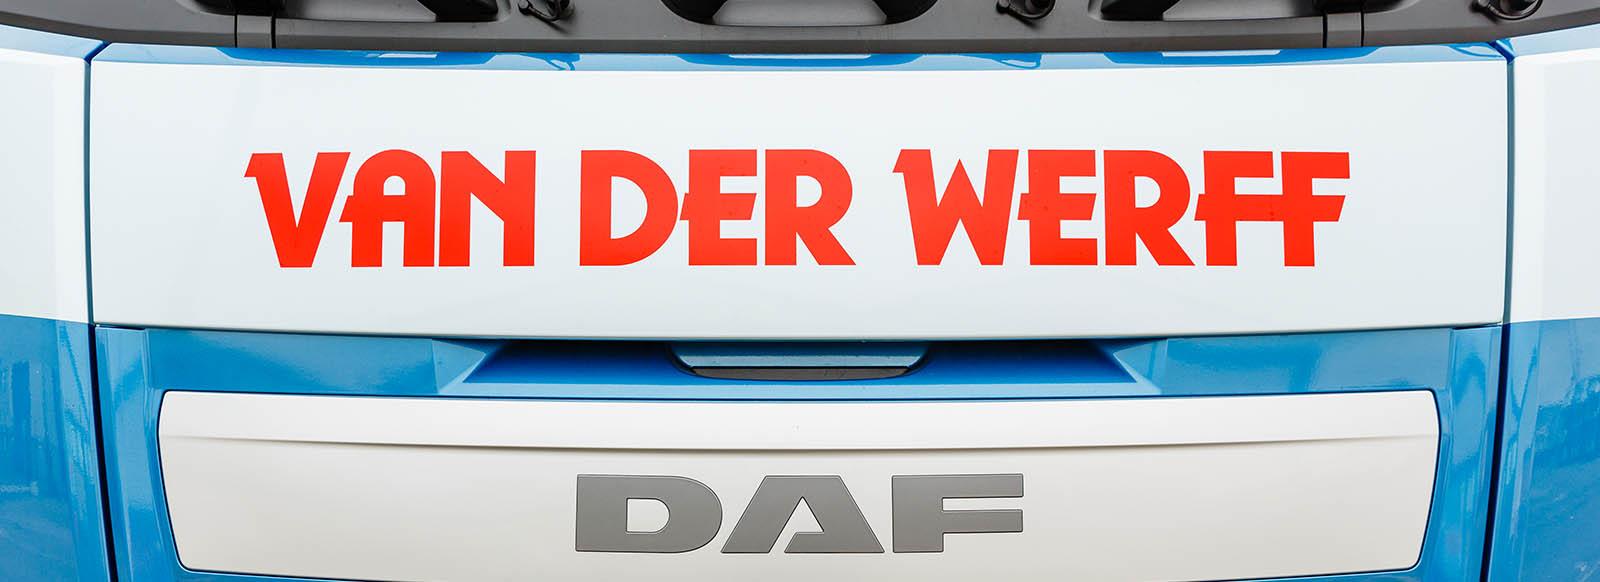 Voorkant met logo van DAF-cabine